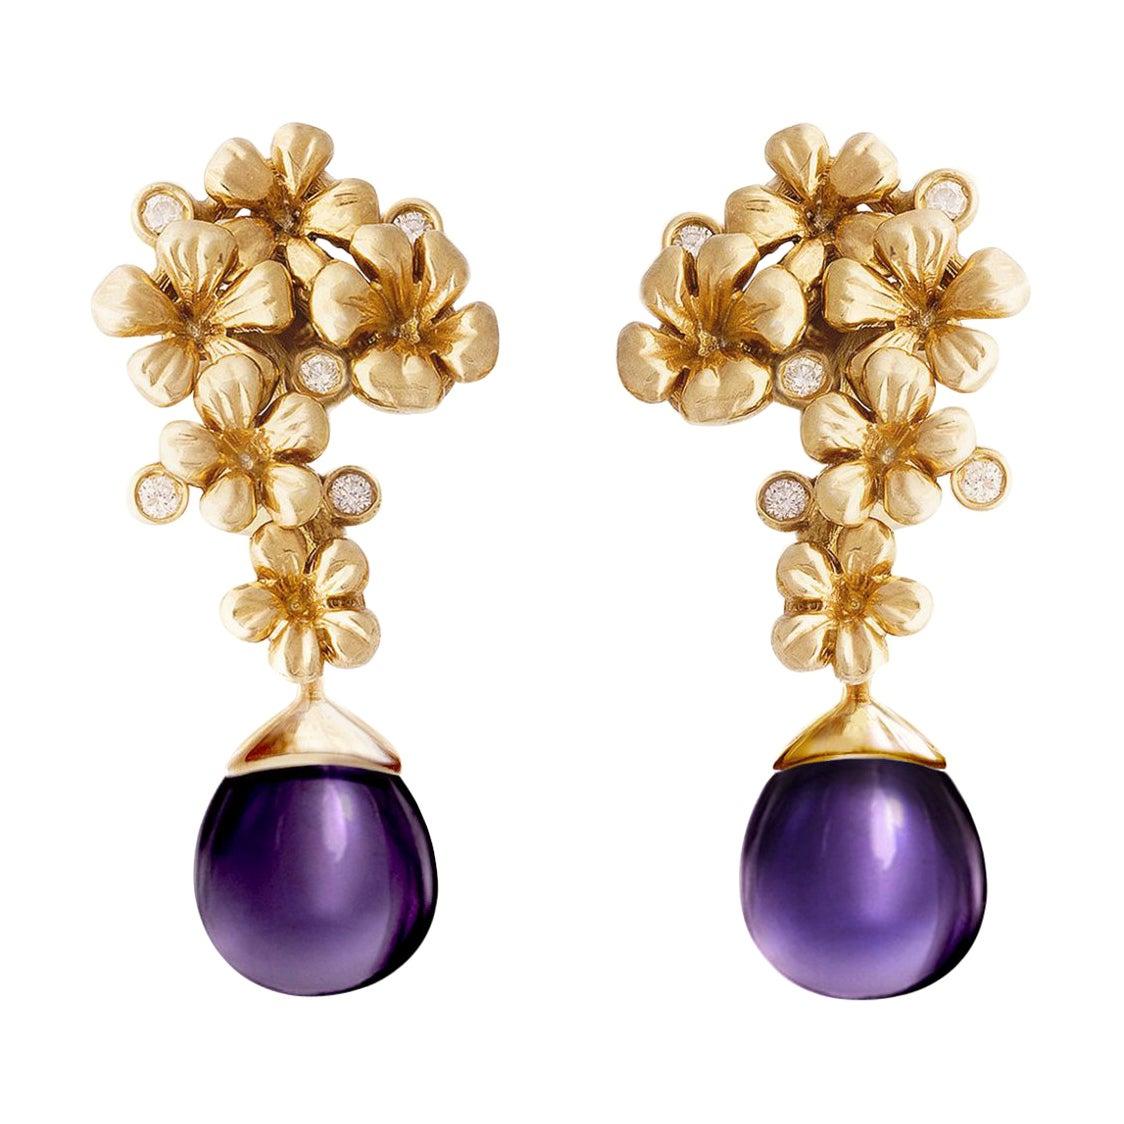 Modern Blossom Cocktail Earrings in 14 Karat Gold, 0.18 Carat Diamonds